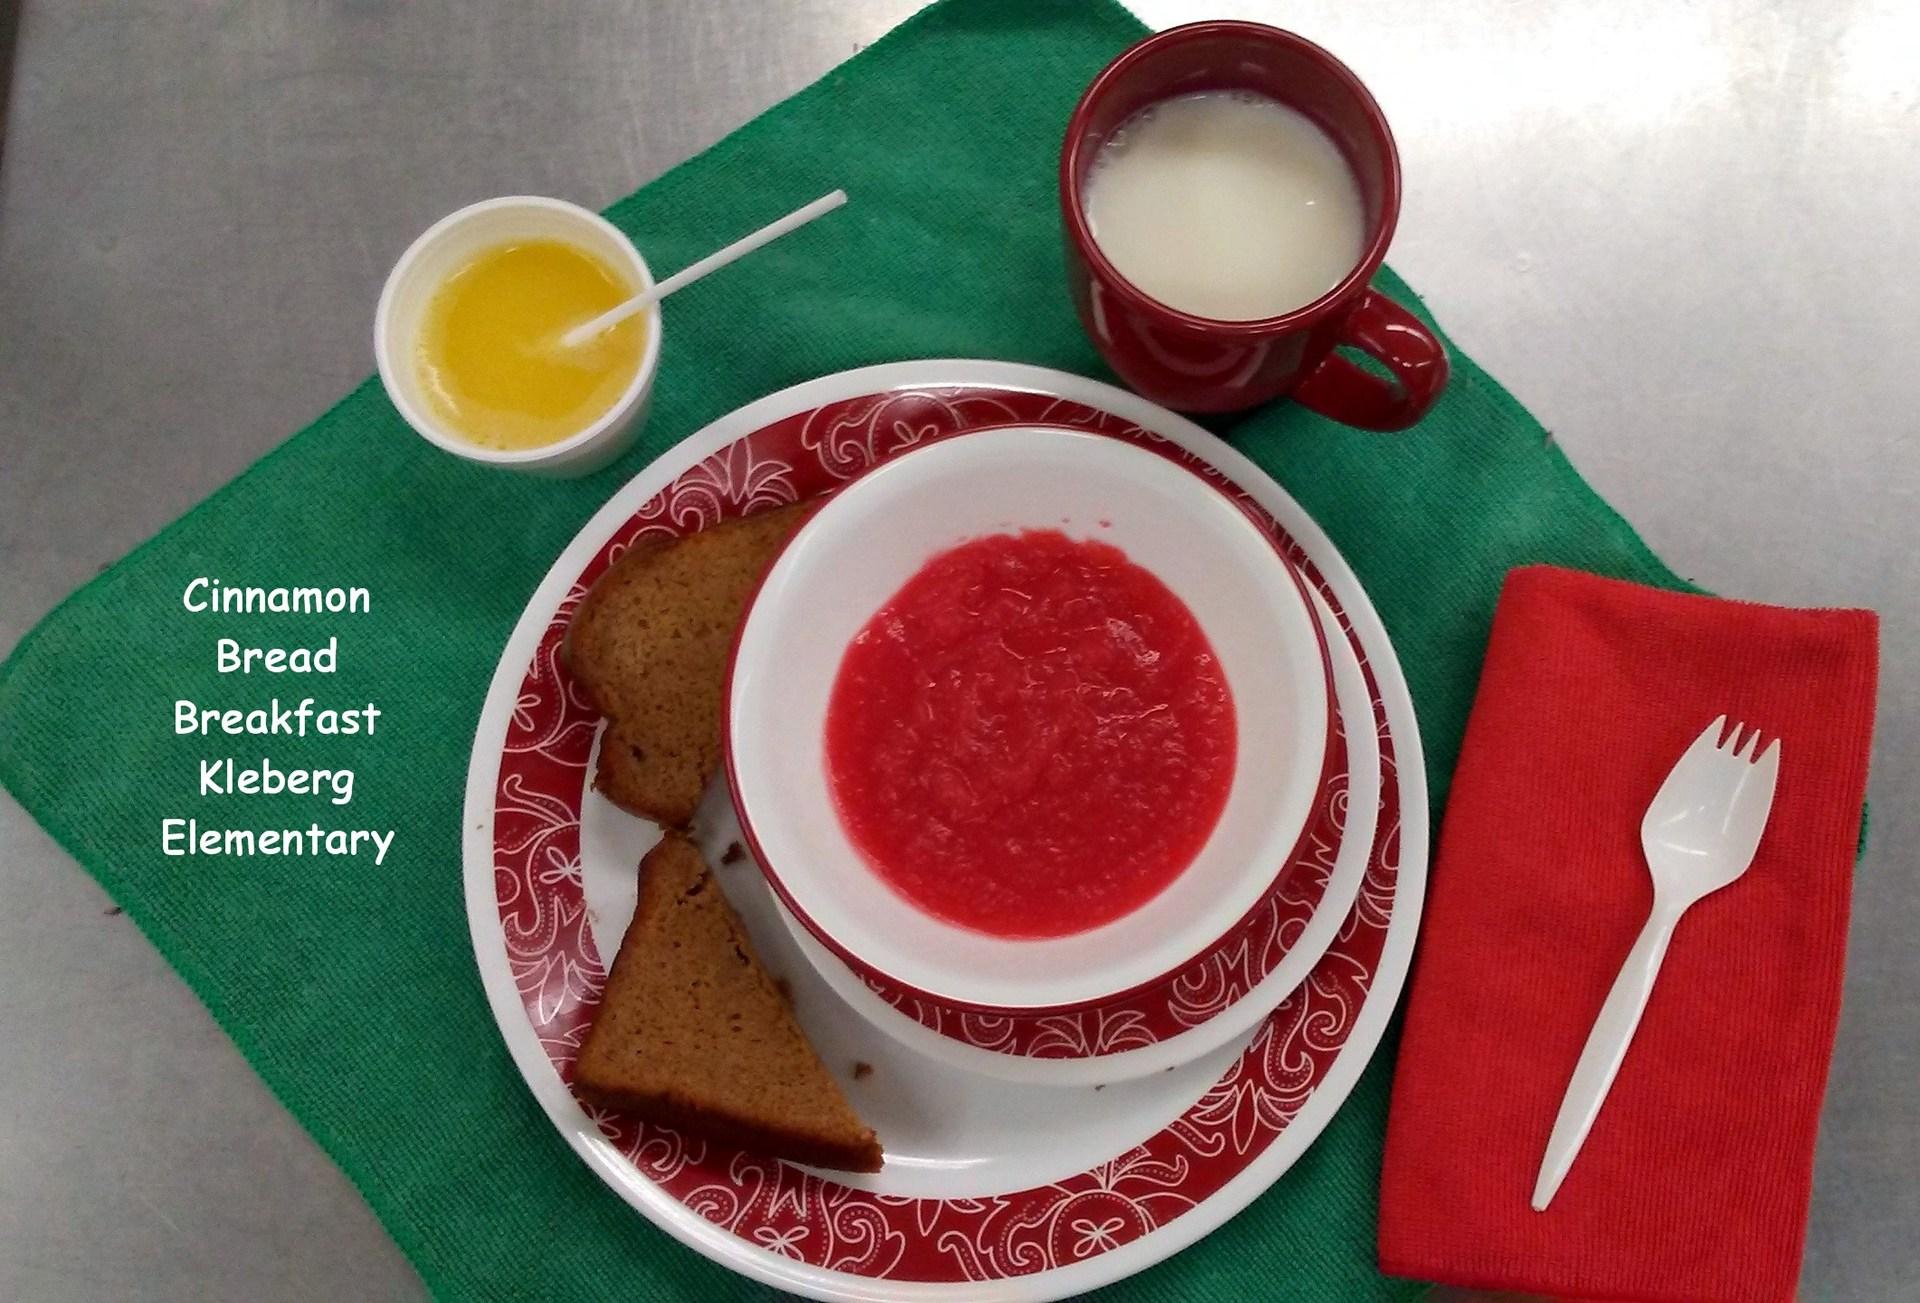 Cinnamon Bread Breakfast Kleberg Elementary